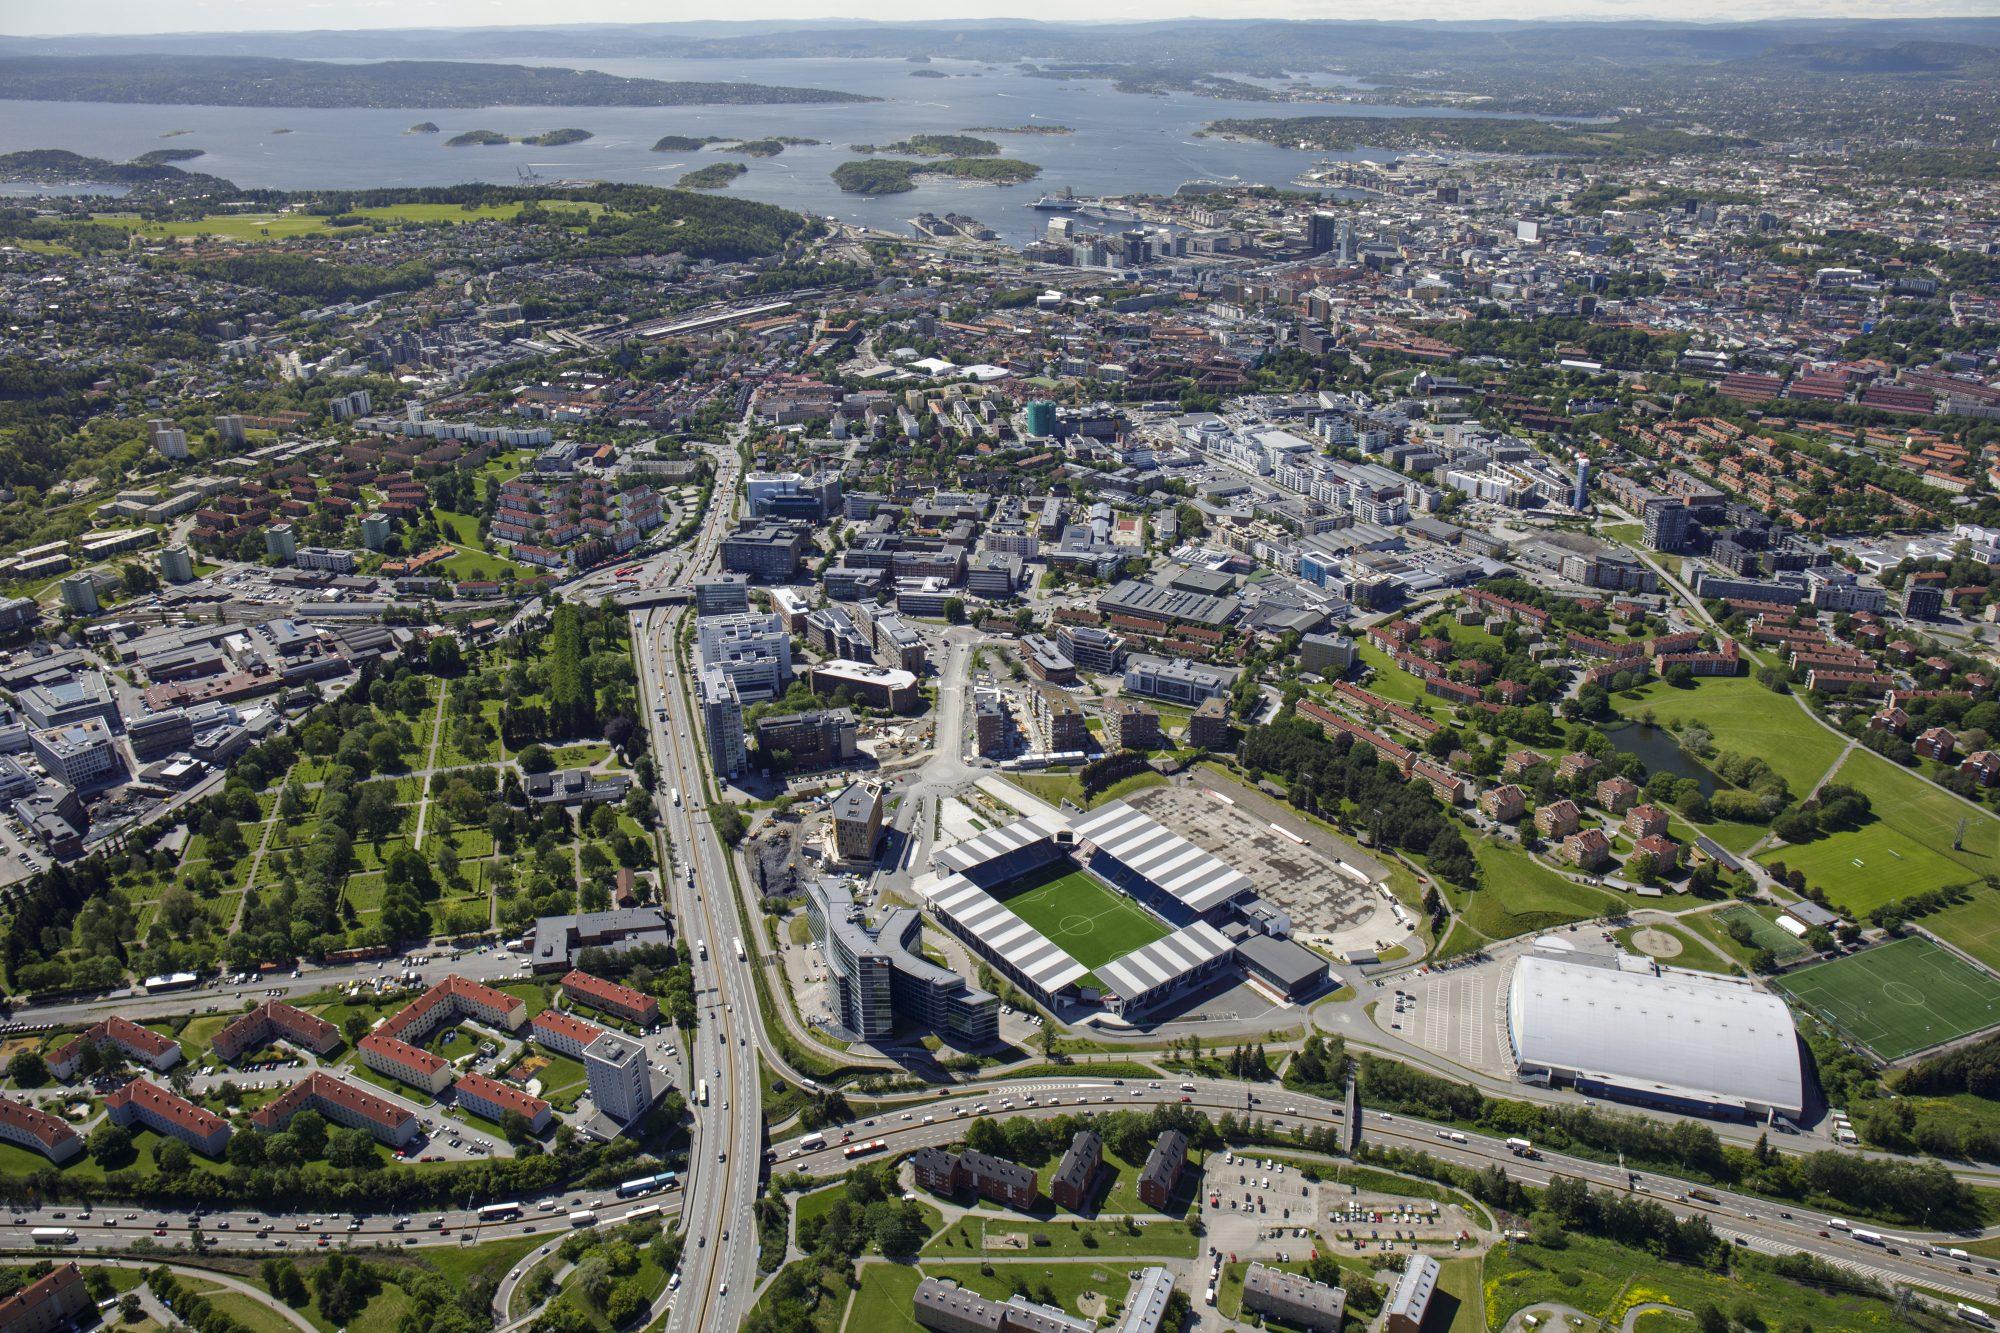 Flyfoto Juni 2019: Helsfyr. Foto: nyebilder.no